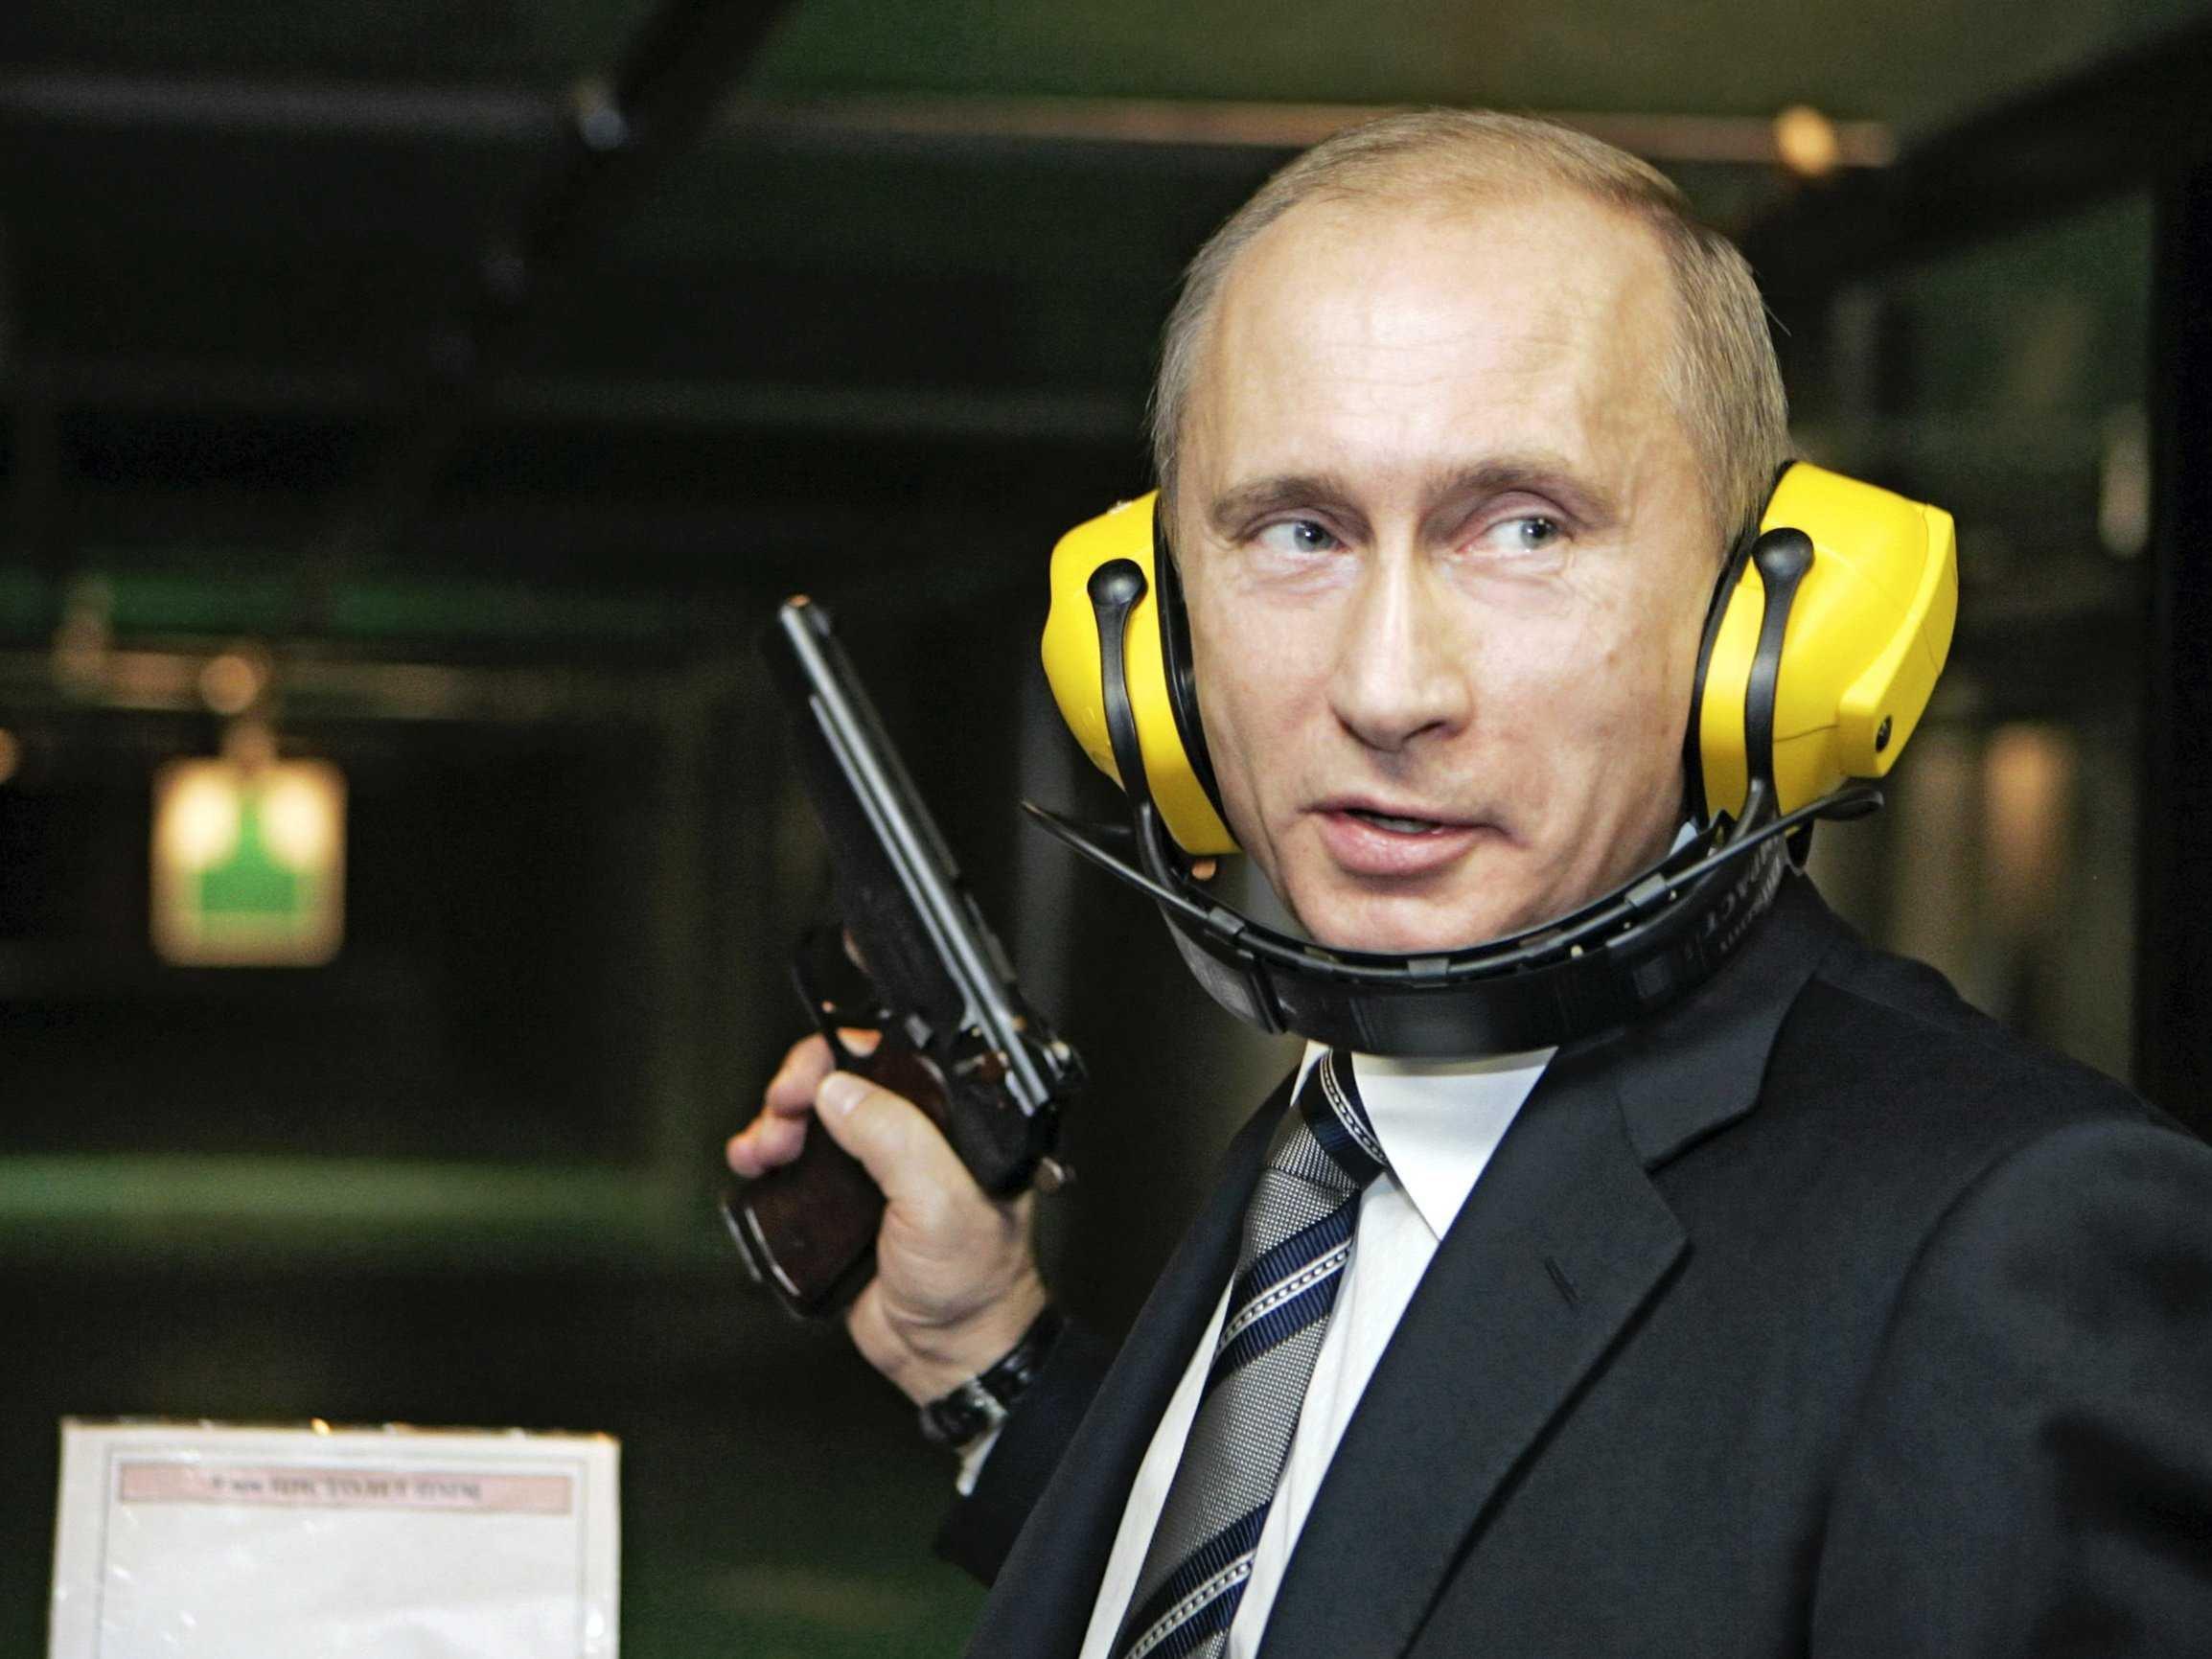 Americans love Putin for destroying Daesh: US analyst